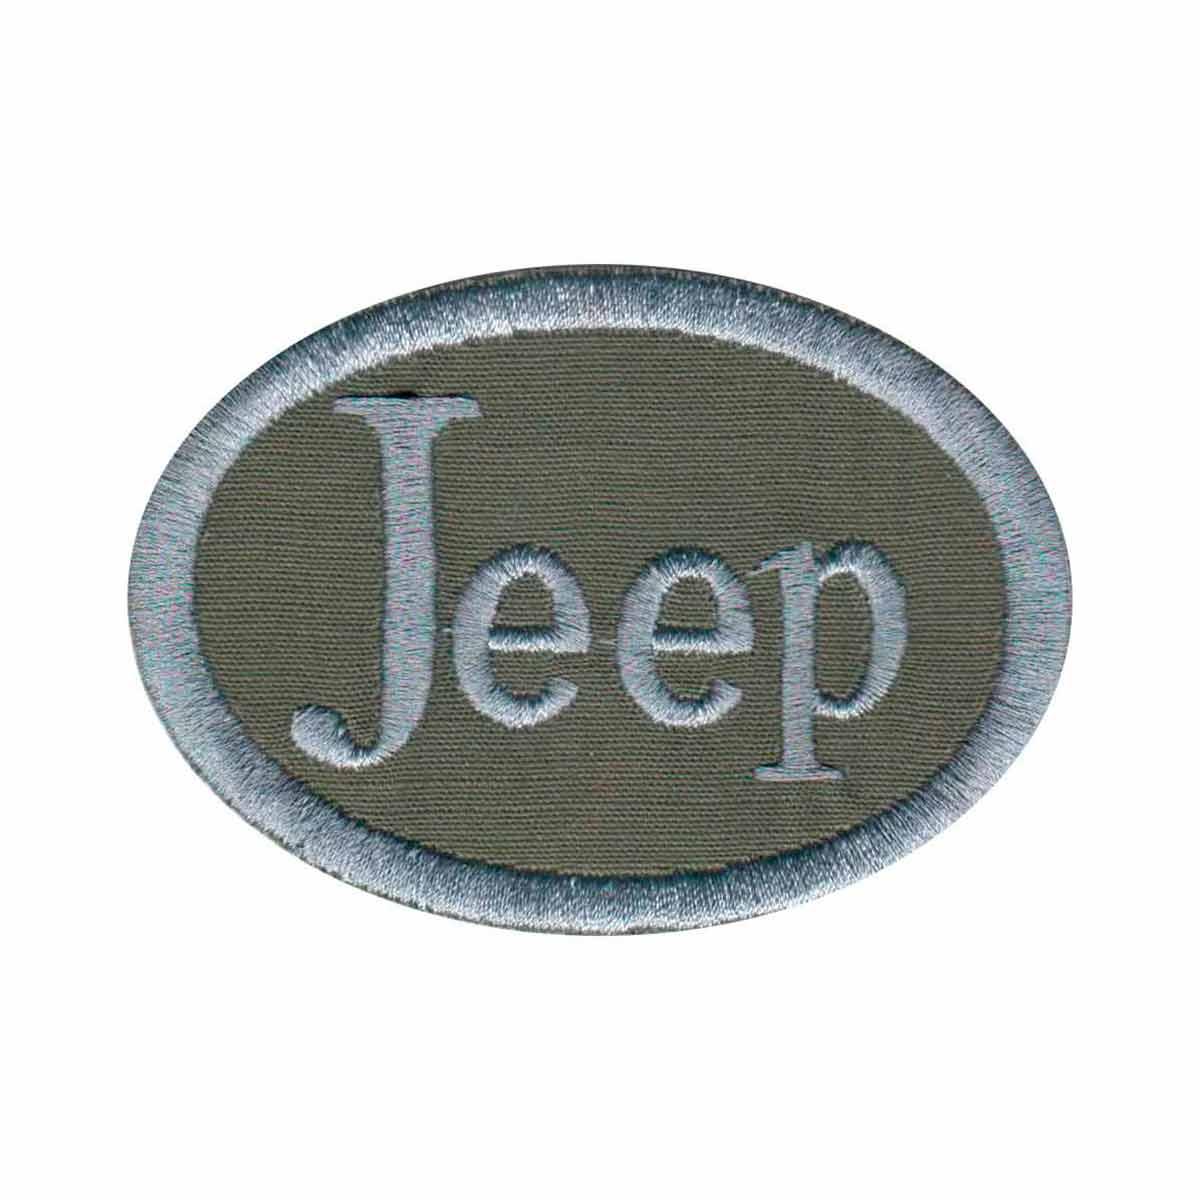 Patch Bordado - Brasão Jeep Militar Vintage AD30056-263  - Talysmã Bordados